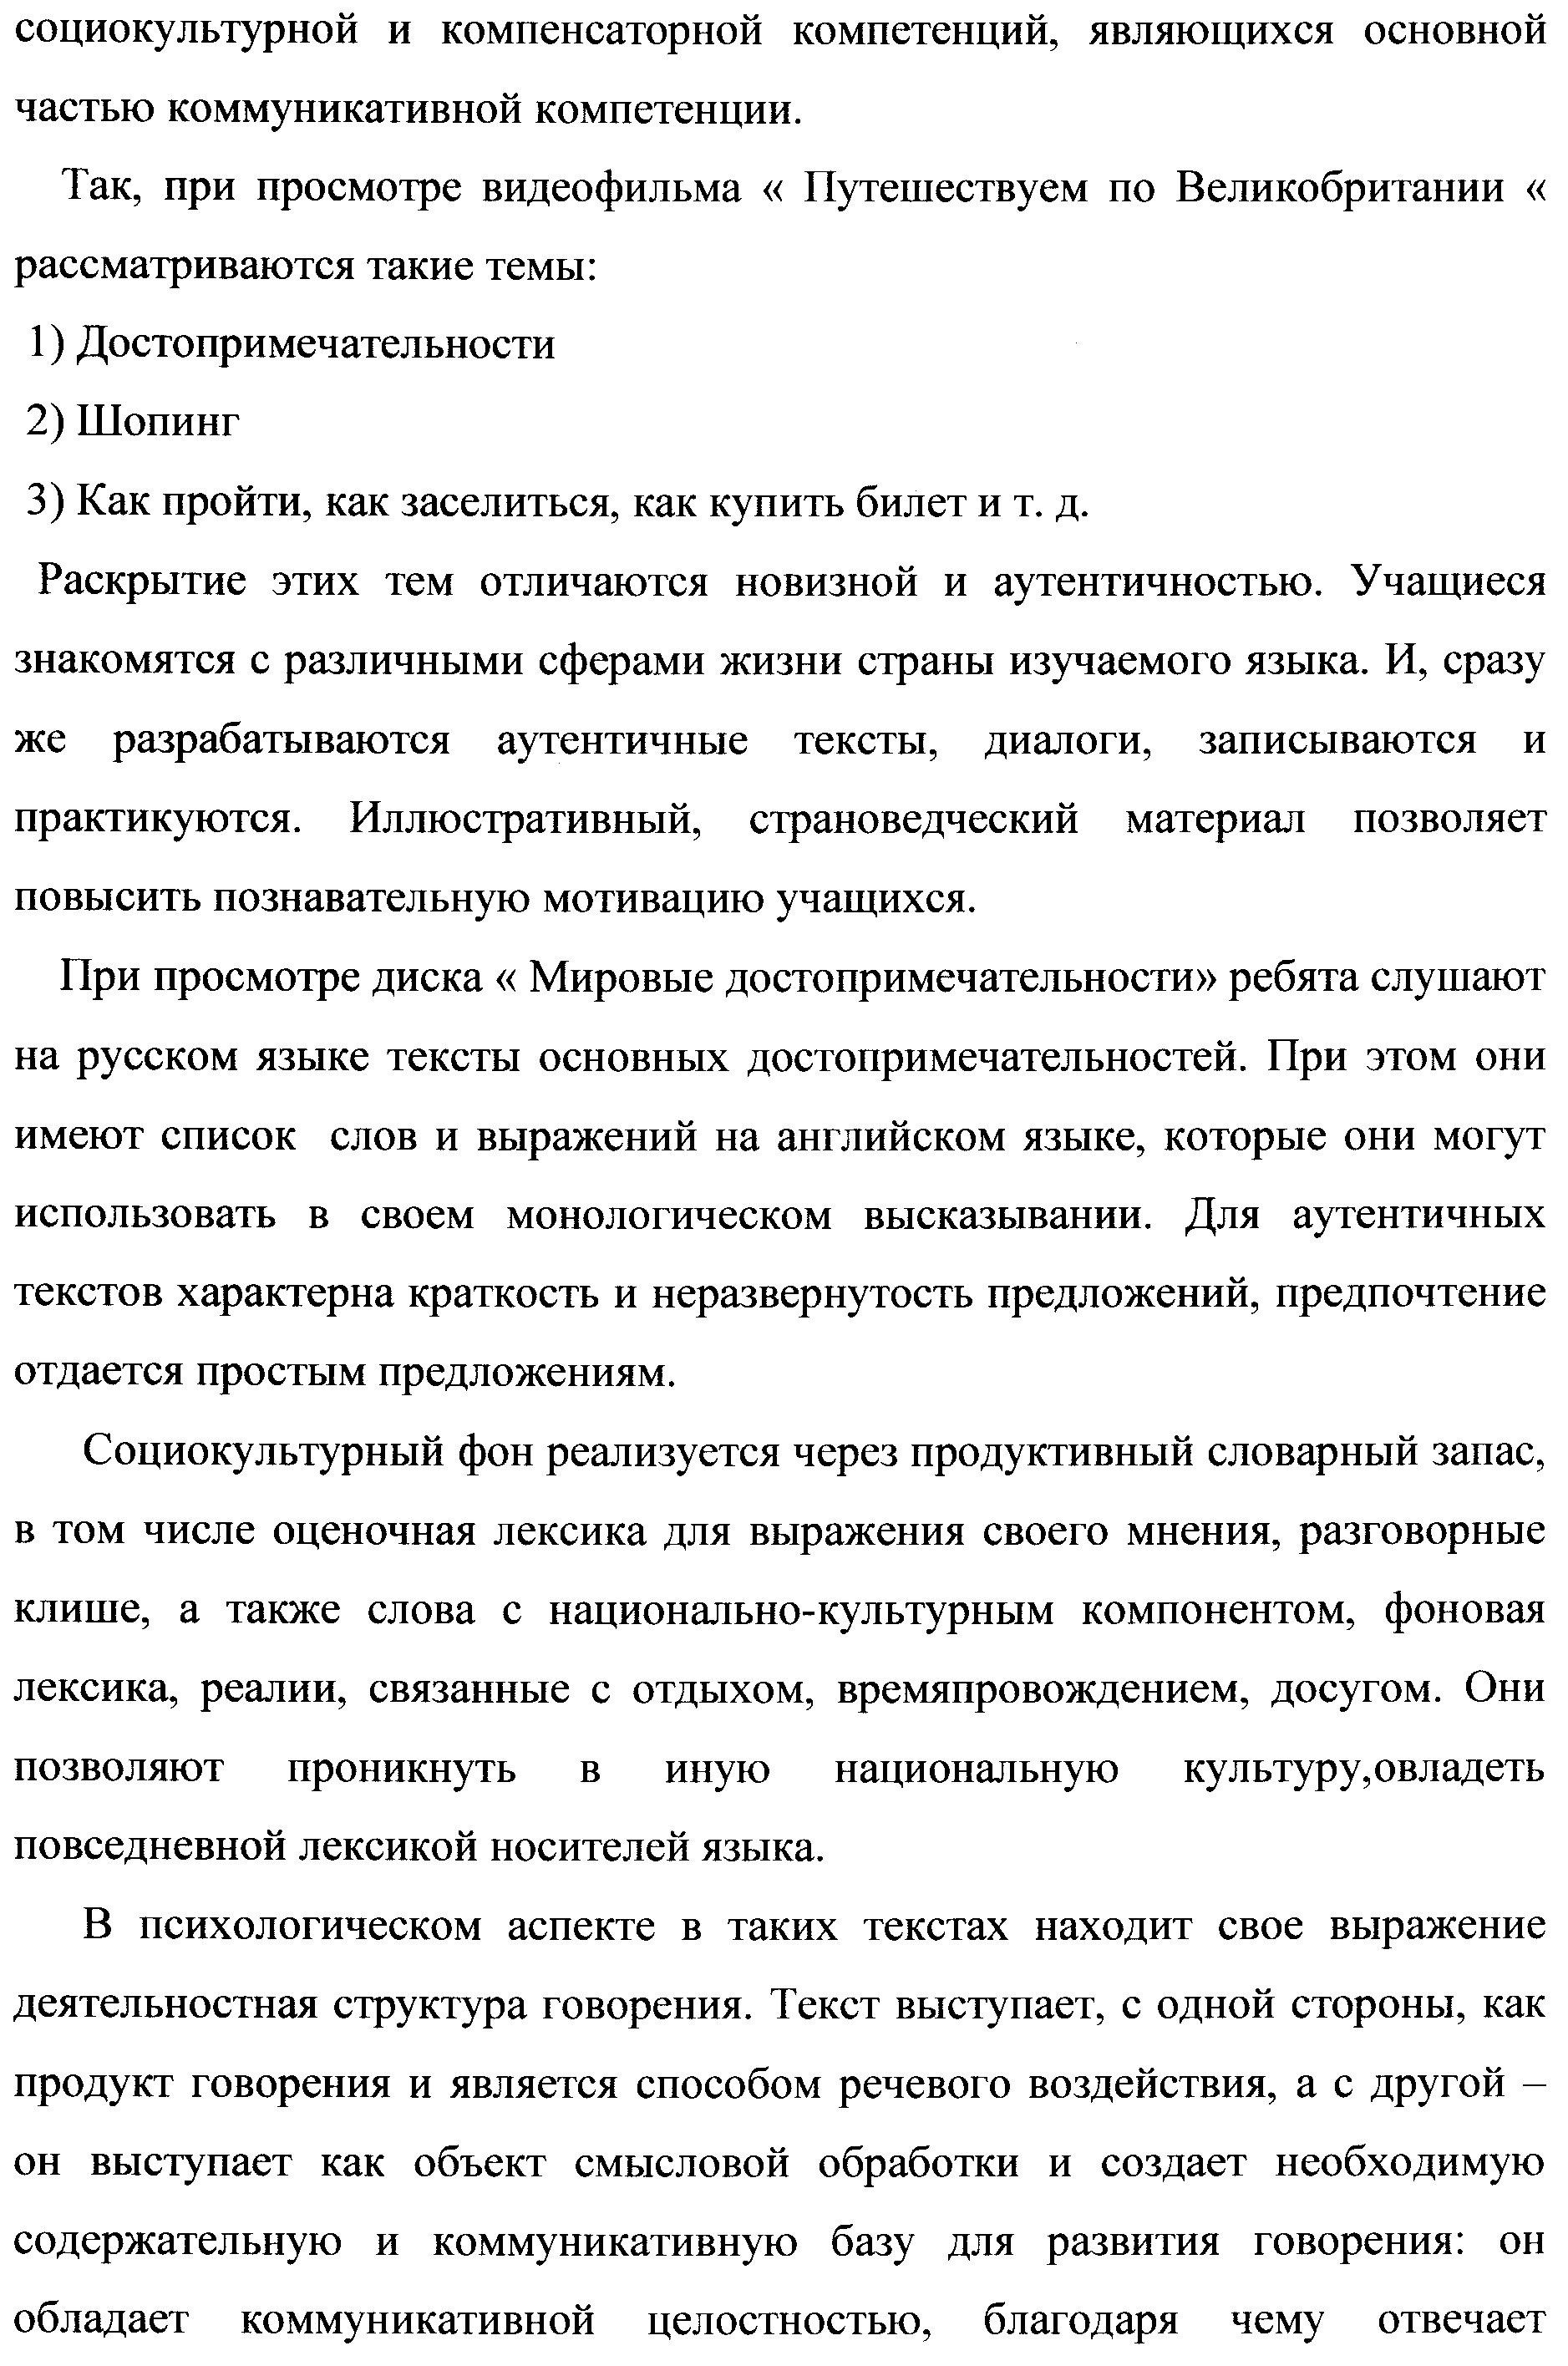 img151